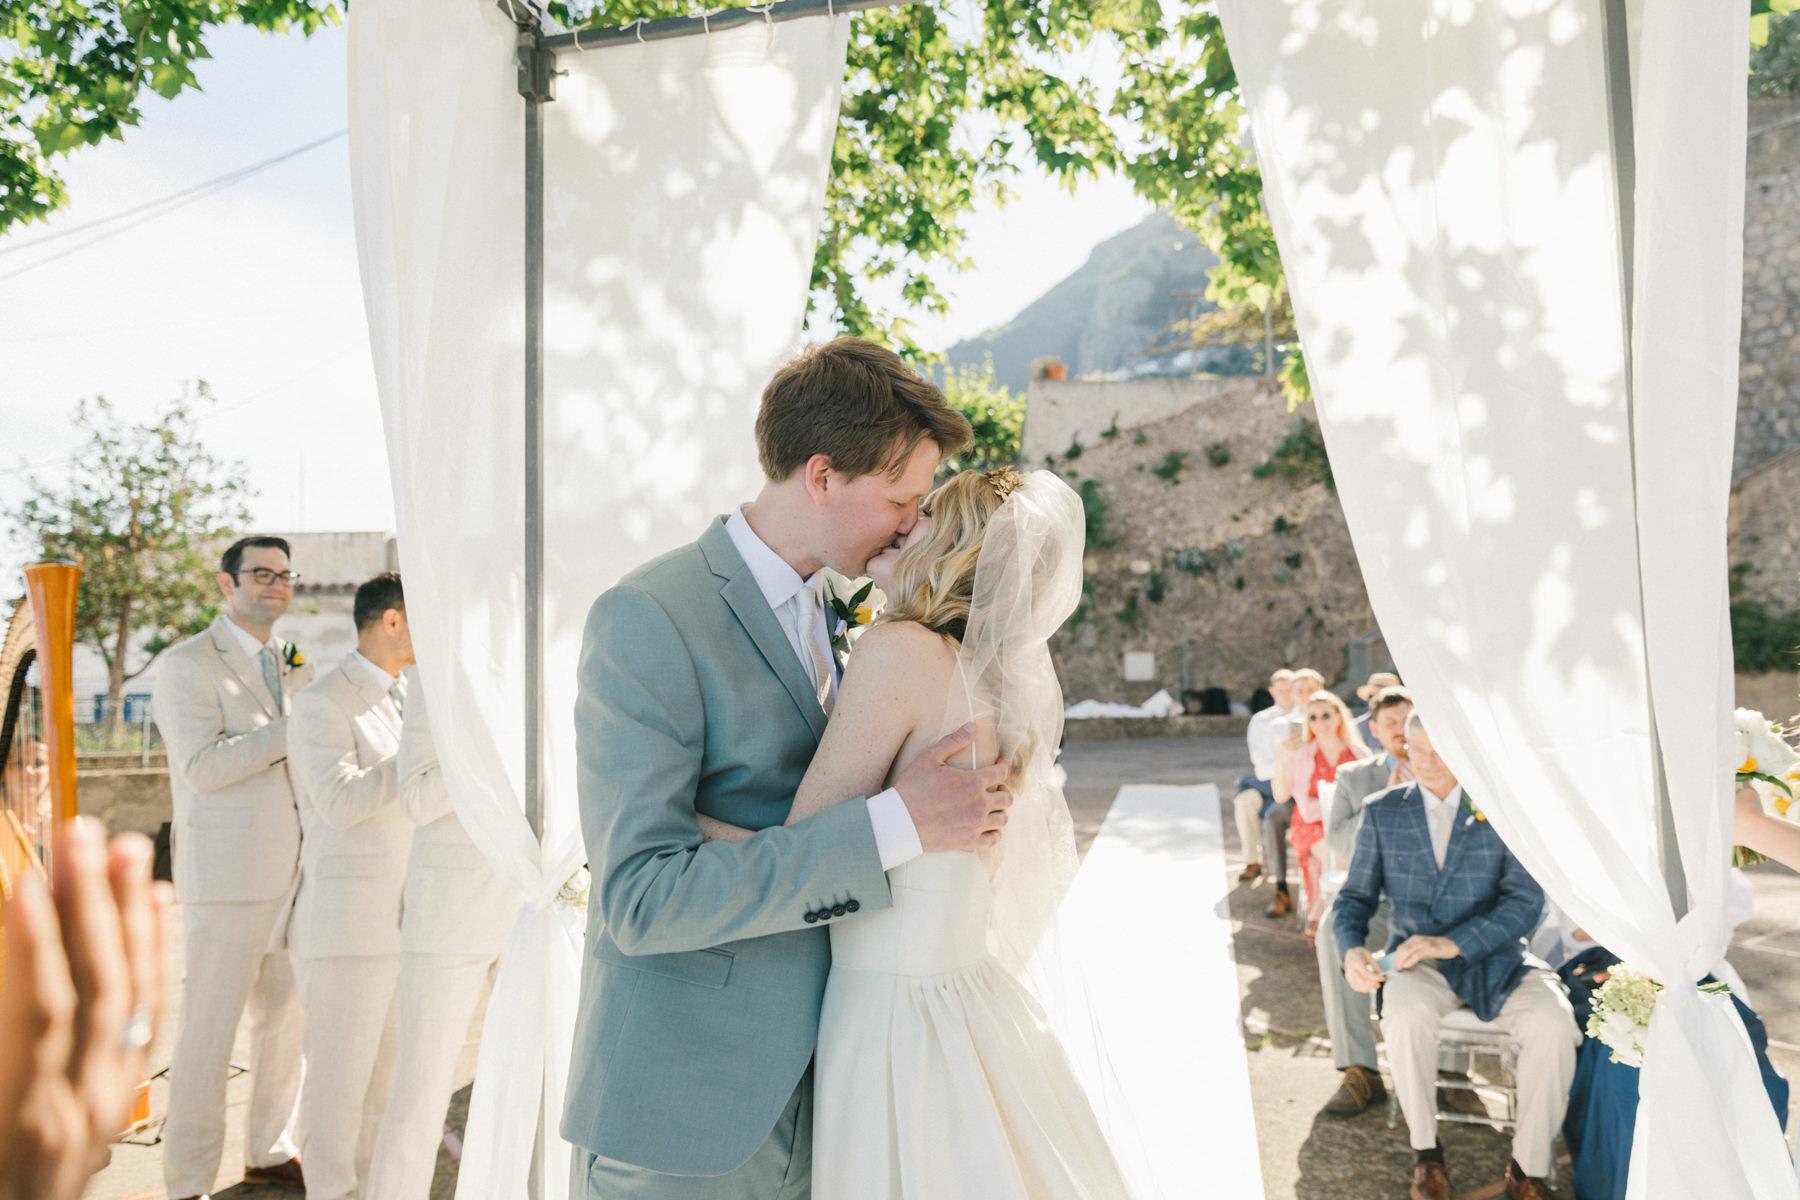 Copy of Fine Art Destination Wedding in Amalfi Coast by CHYMO & MORE